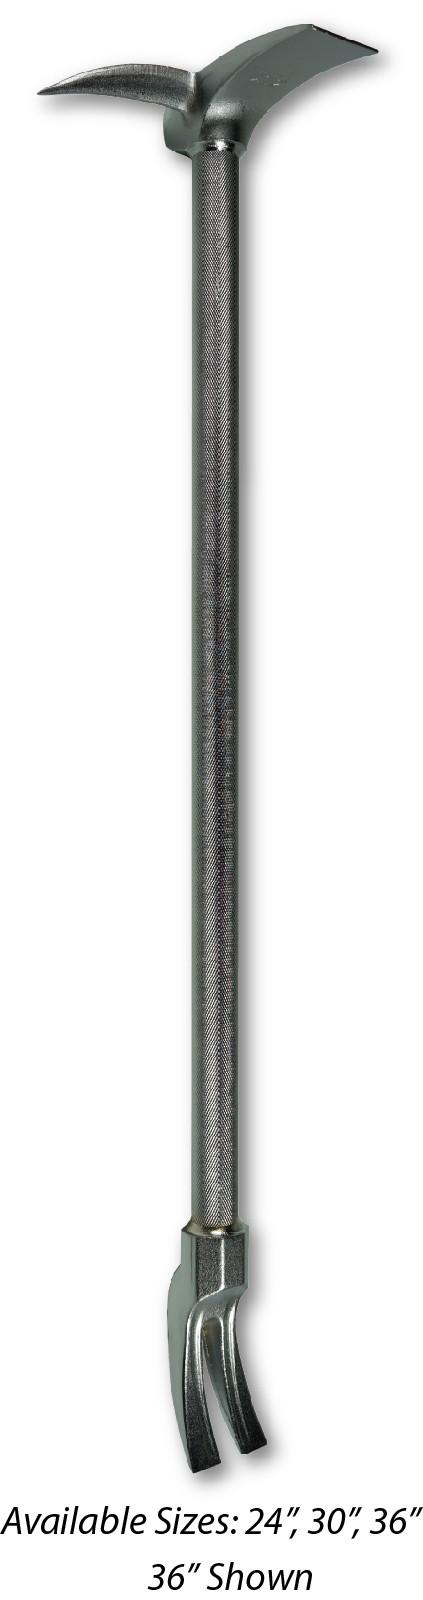 "NEW! ZT302-30 Alloy Entry Tool - Nickel 30"""